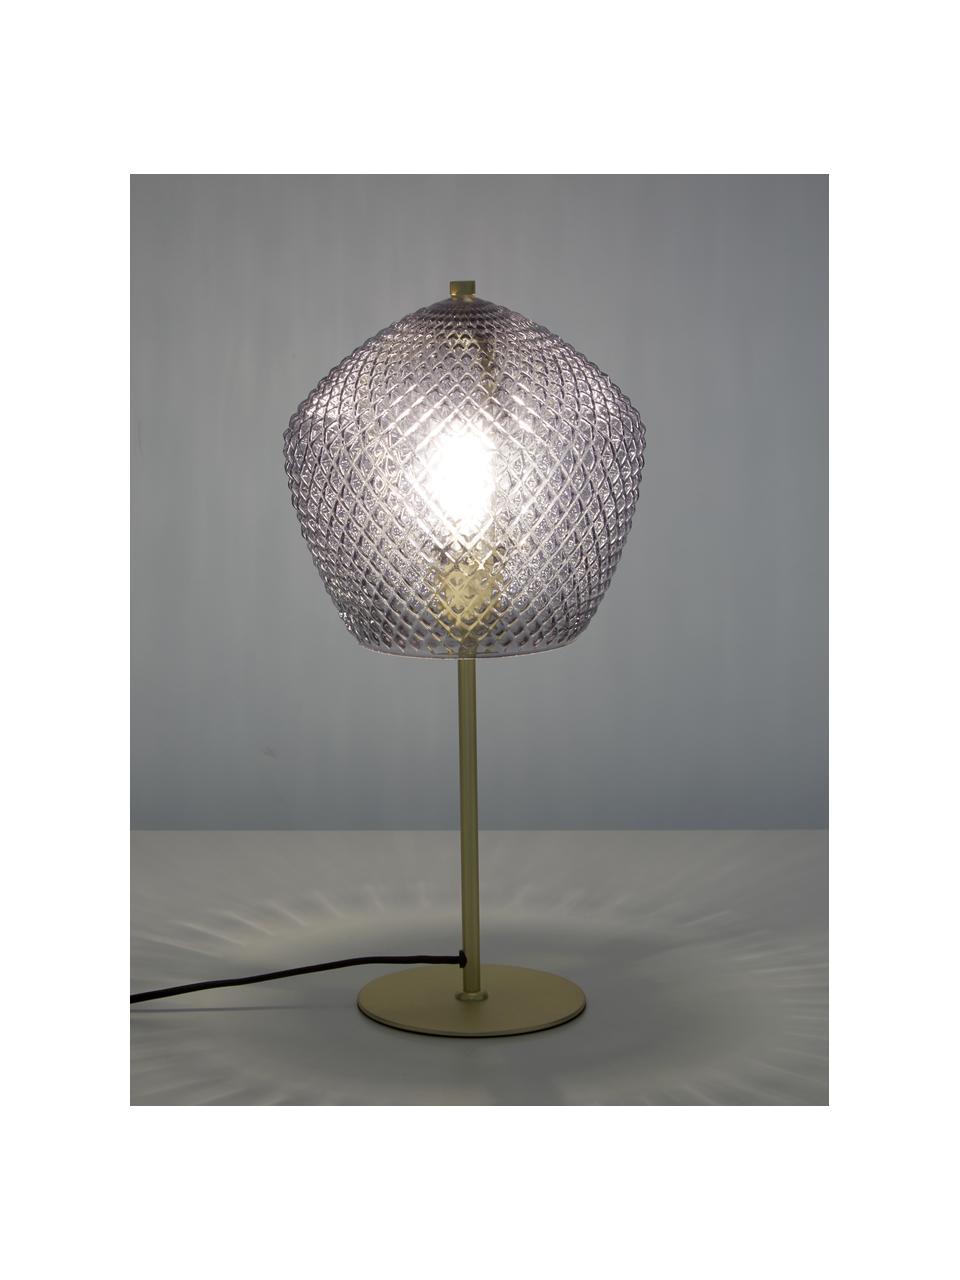 Tafellamp Orbiform met glazen lampenkap, Lampenkap: glas, Lampvoet: gecoat metaal, Goudkleurig, transparant, Ø 23 cm